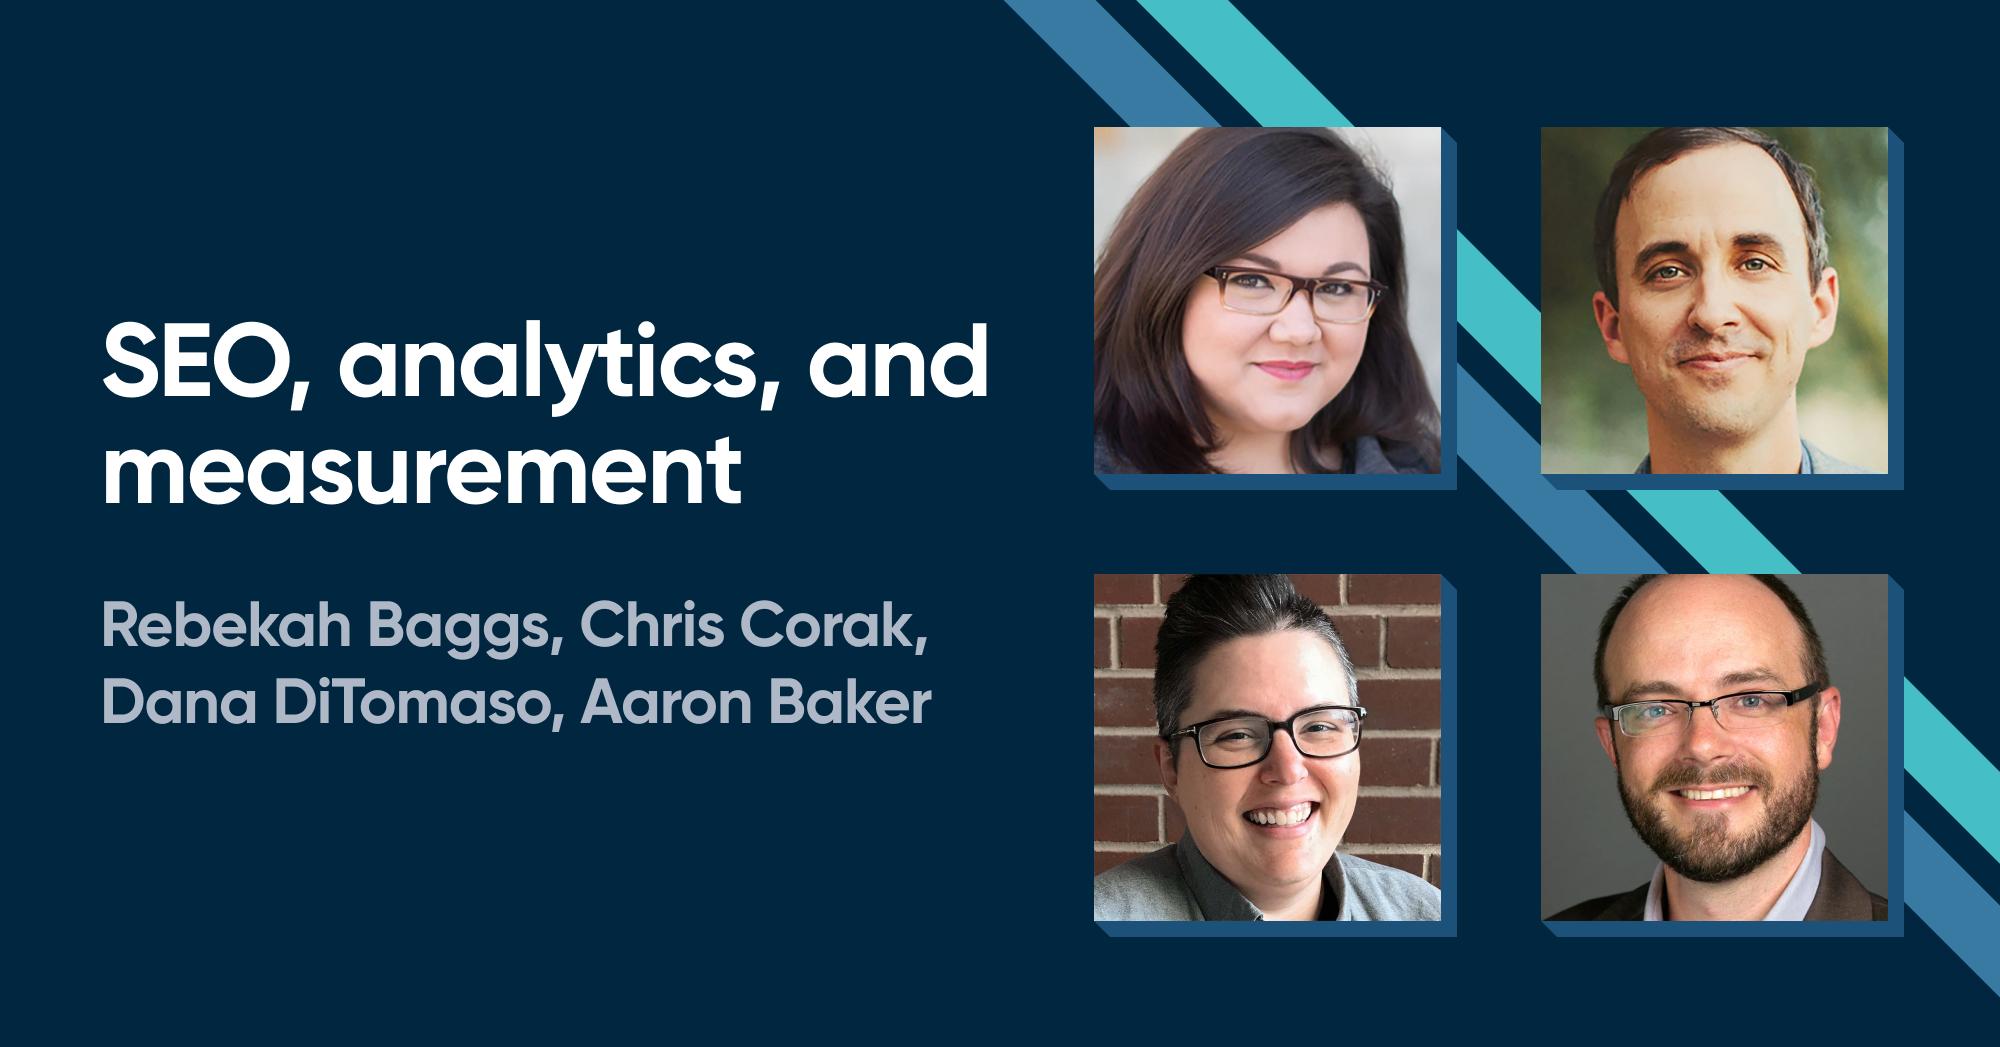 SEO, analytics, and measurement